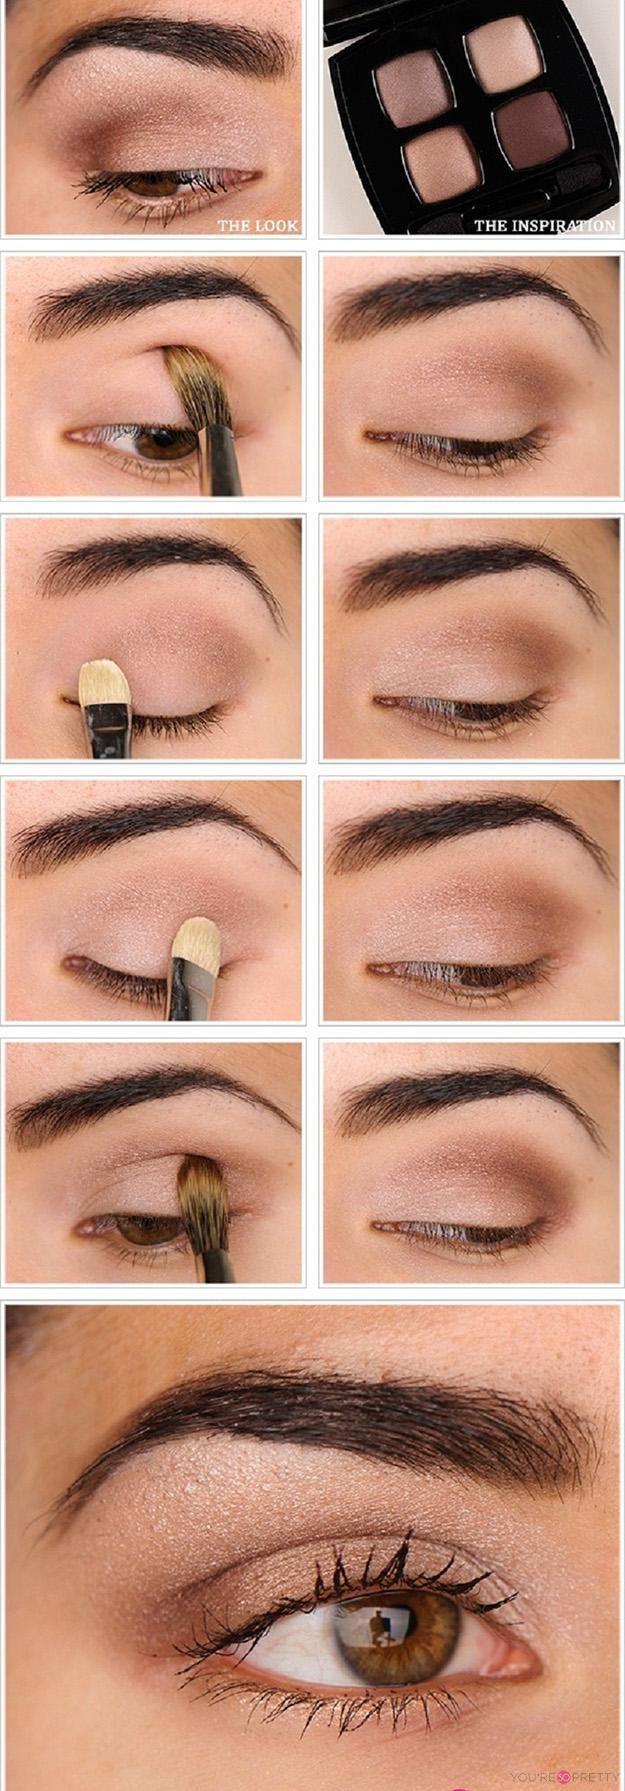 Everyday Natural Makeup Tutorials   How To Apply Eye Makeup, tutorials, and makeup tips at You're So Pretty. #youresopretty   youresopretty.com